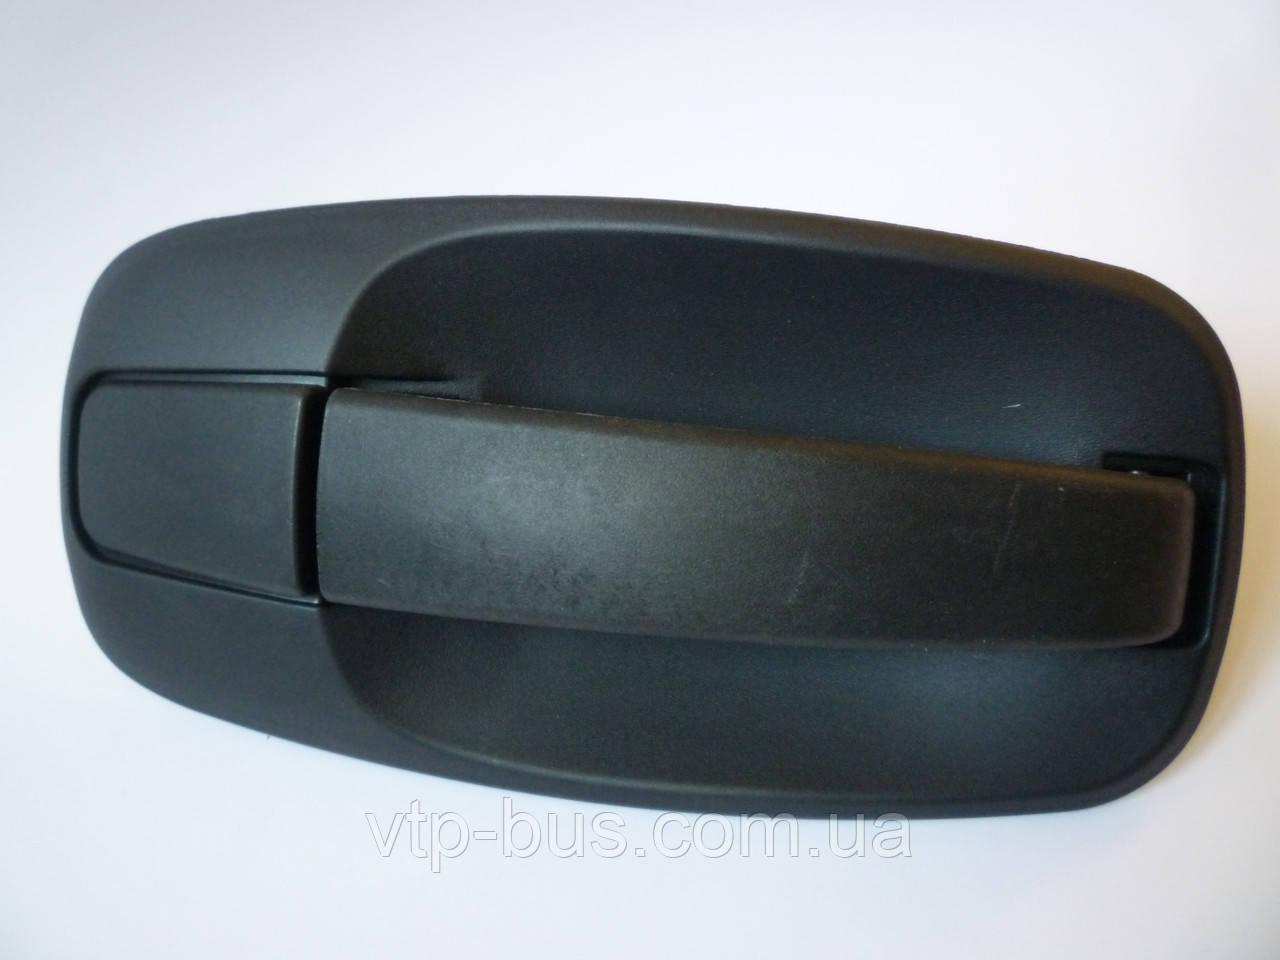 Ручка раздвижной двери, внешняя на Renault Trafic 2001... Transporterparts (Франция), 05.0001